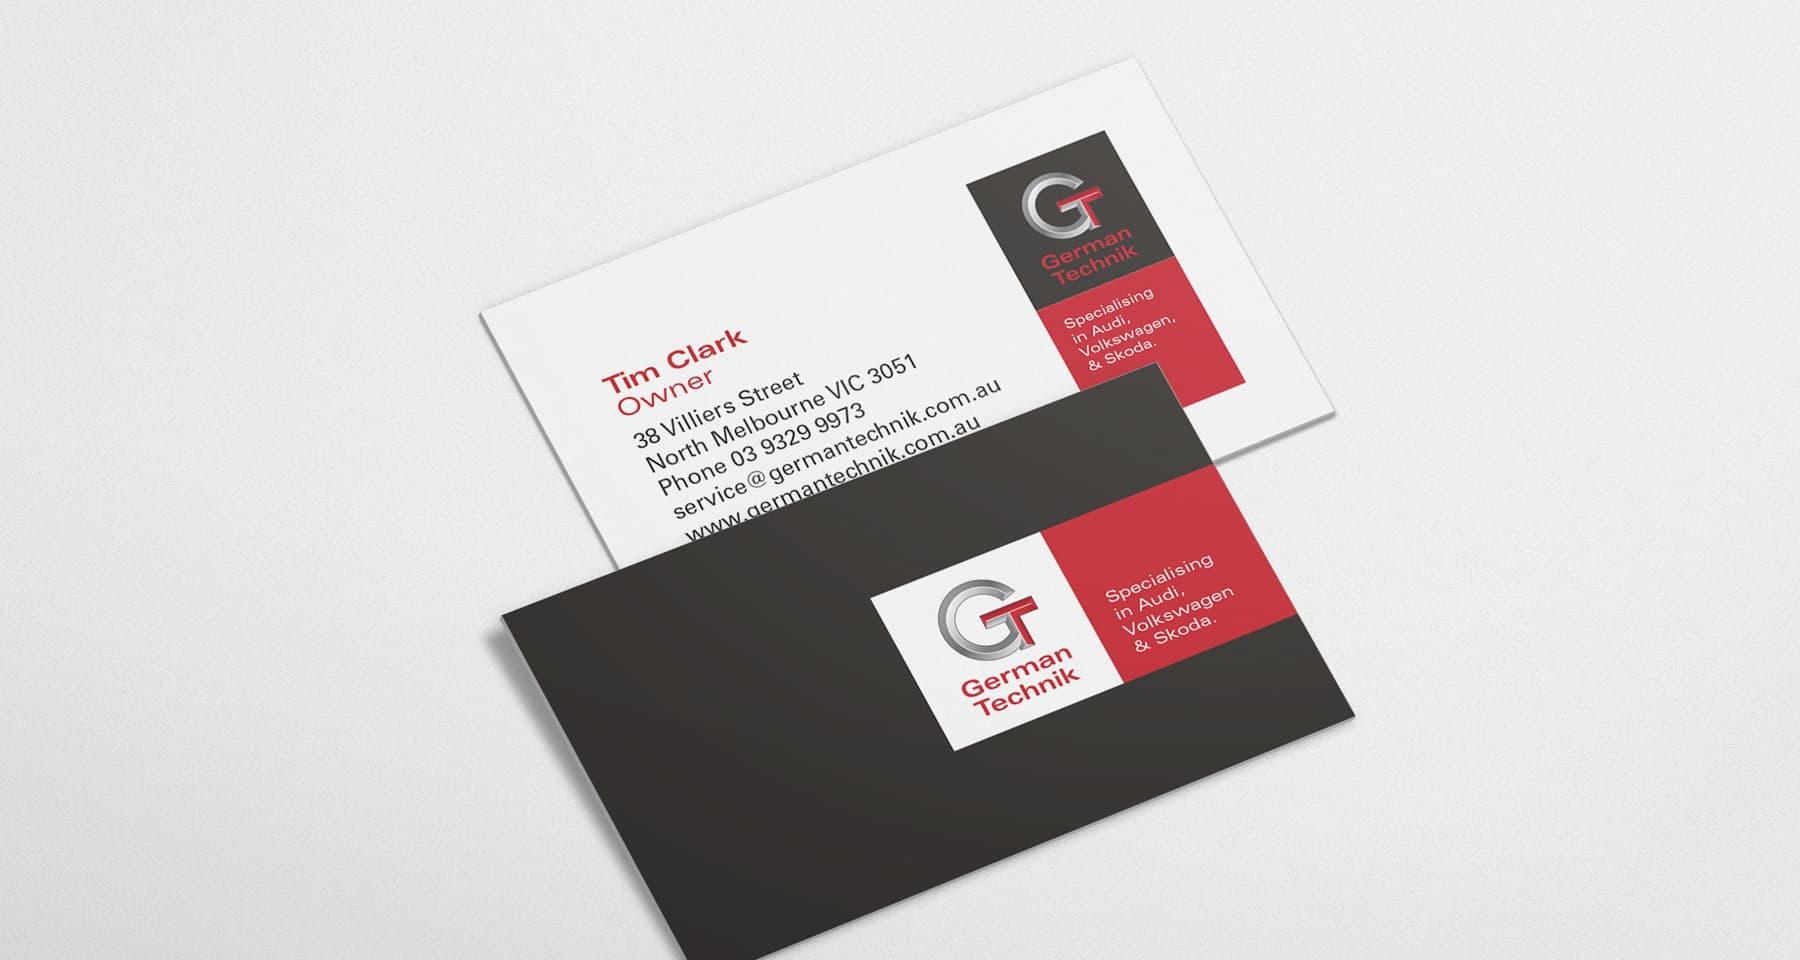 German technik business cards studio ink german technik business cards colourmoves